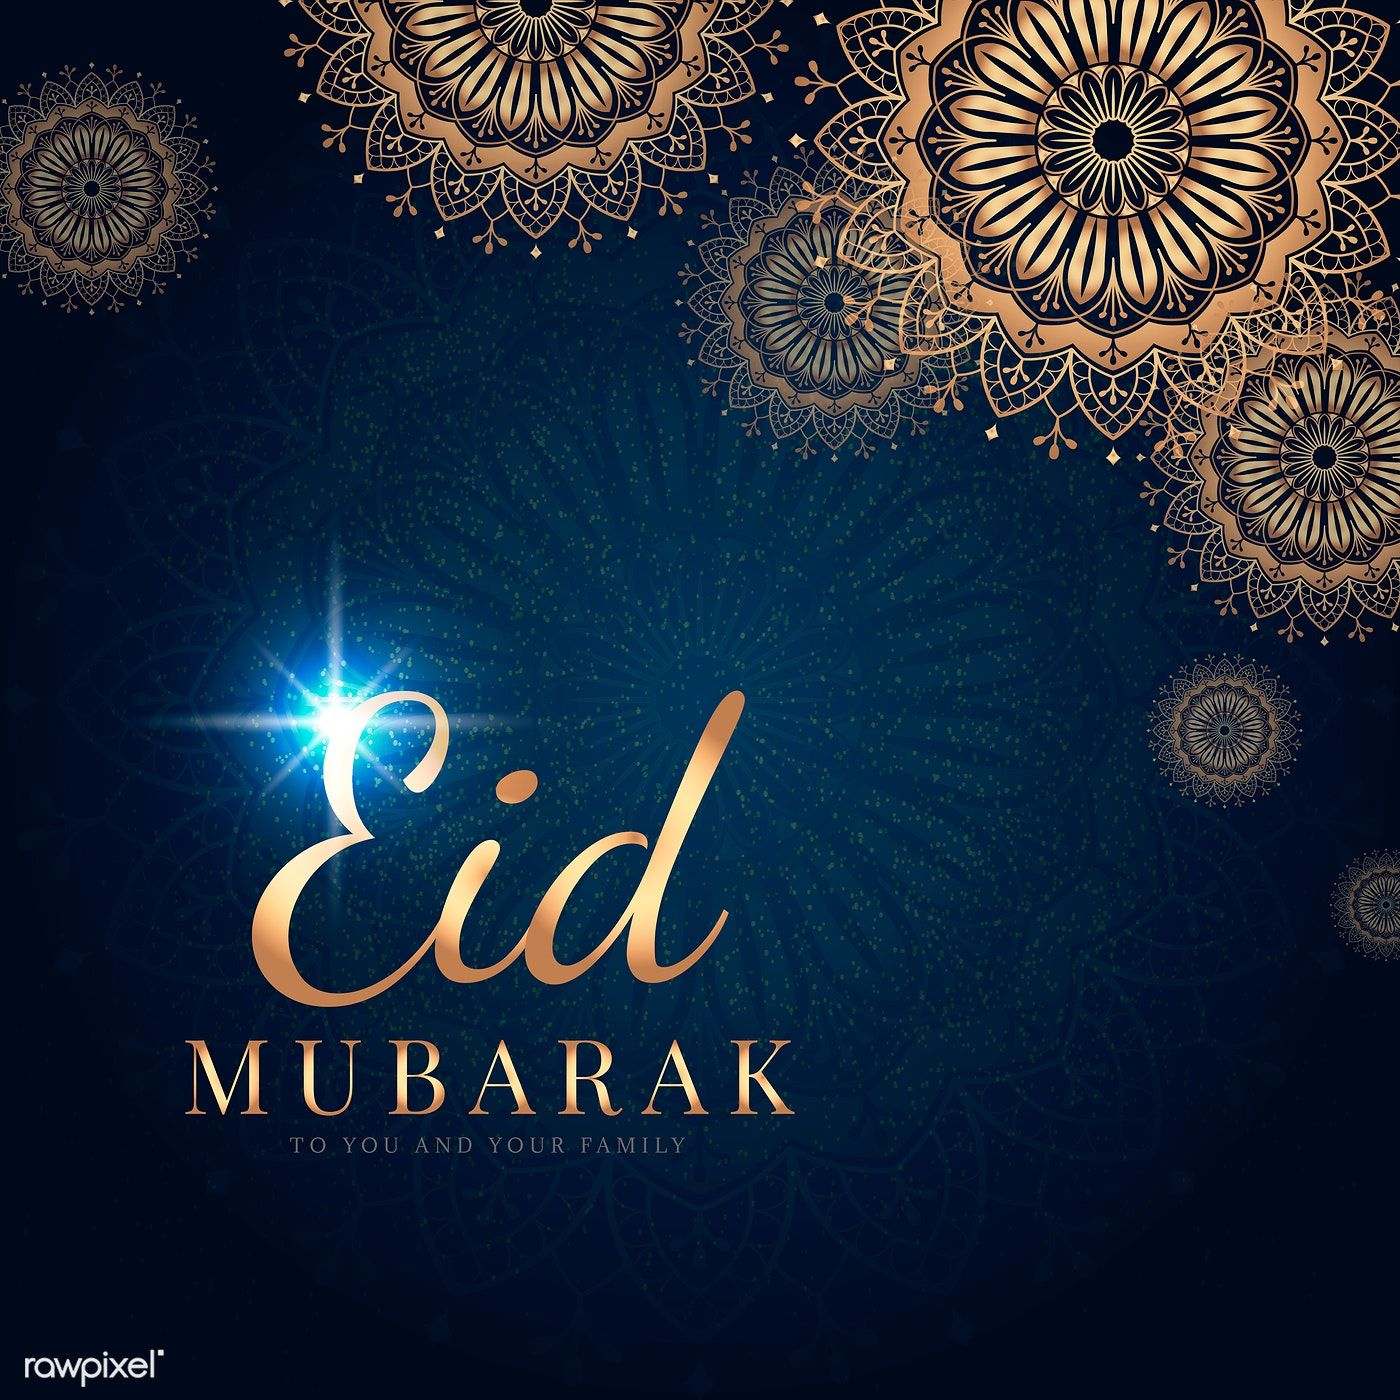 Download Premium Vector Of Eid Mubarak Card With Mandala Pattern Eid Mubarak Card Eid Mubarak Images Eid Mubarak Wishes